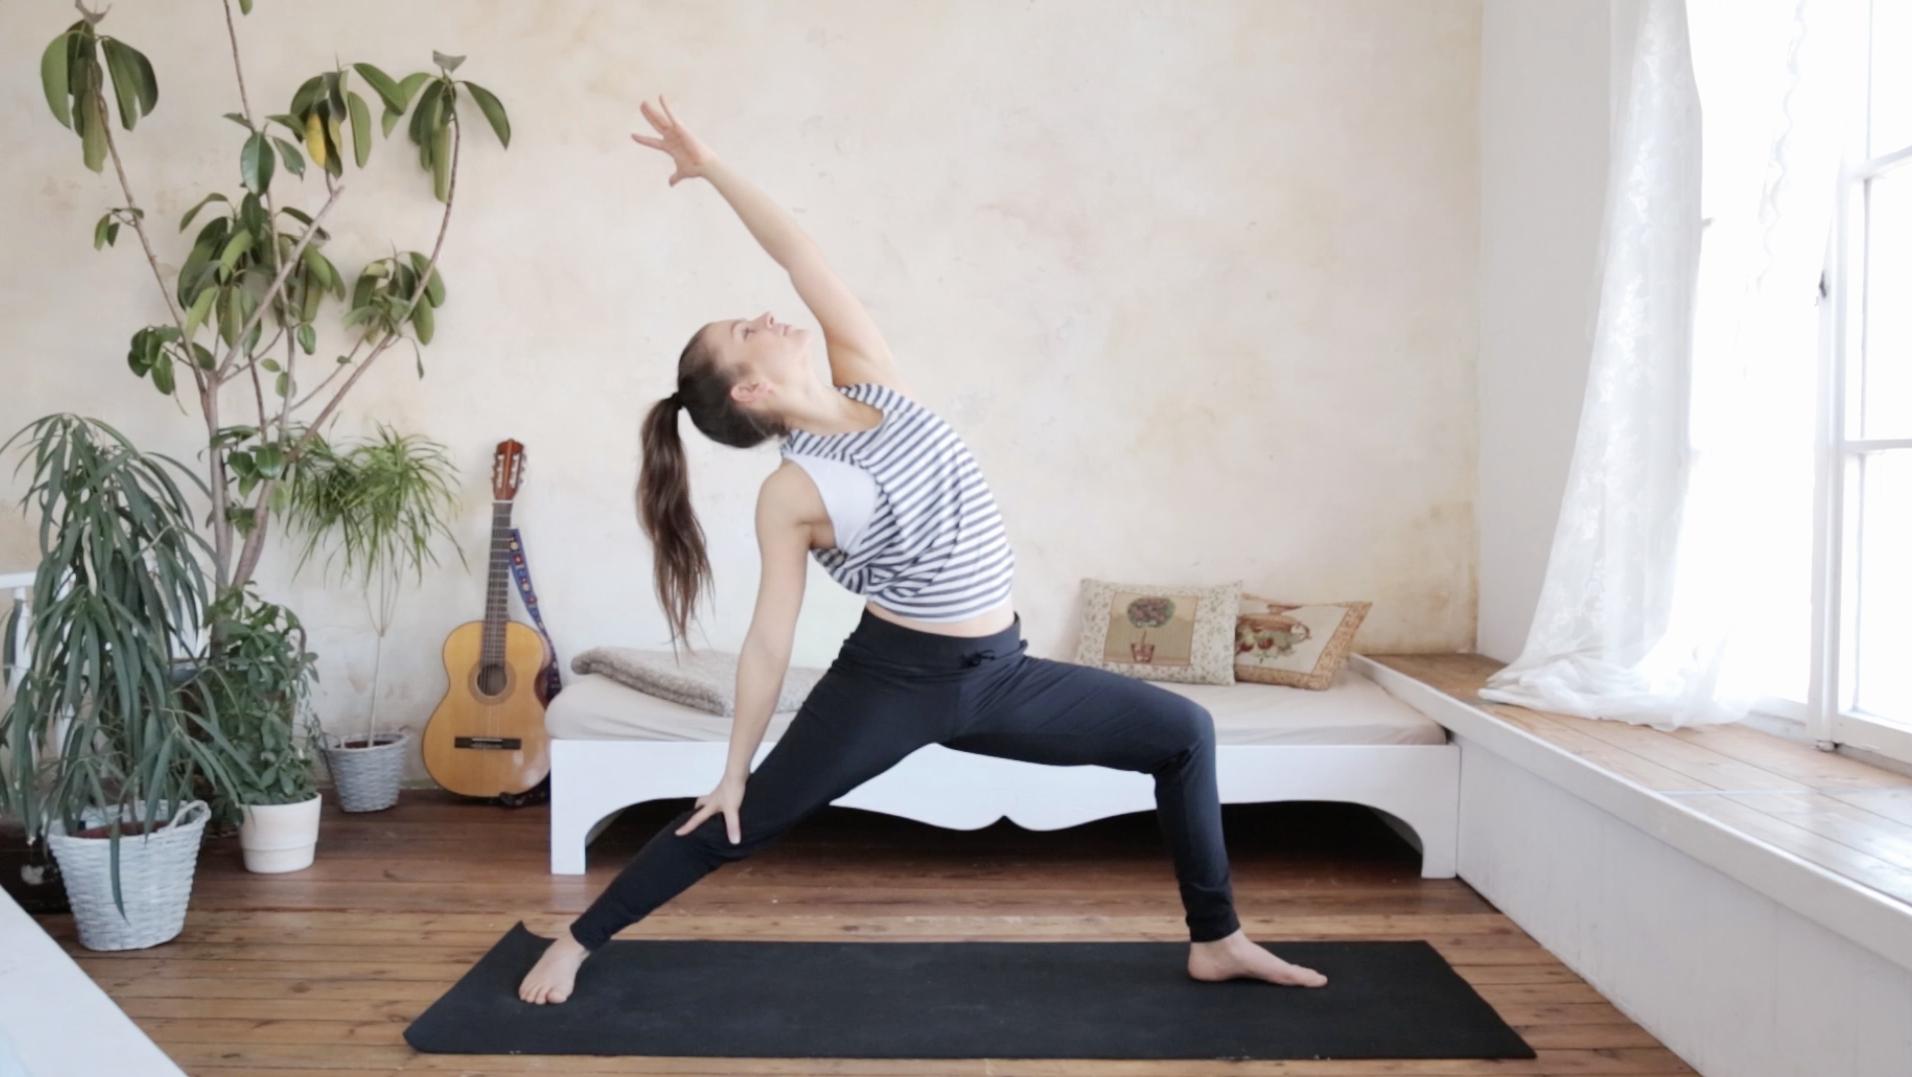 Yoga Morgen Routine Wach Energiegeladen Perfekter Start In Den Tag Mady Morrison Yoga Lifestyle